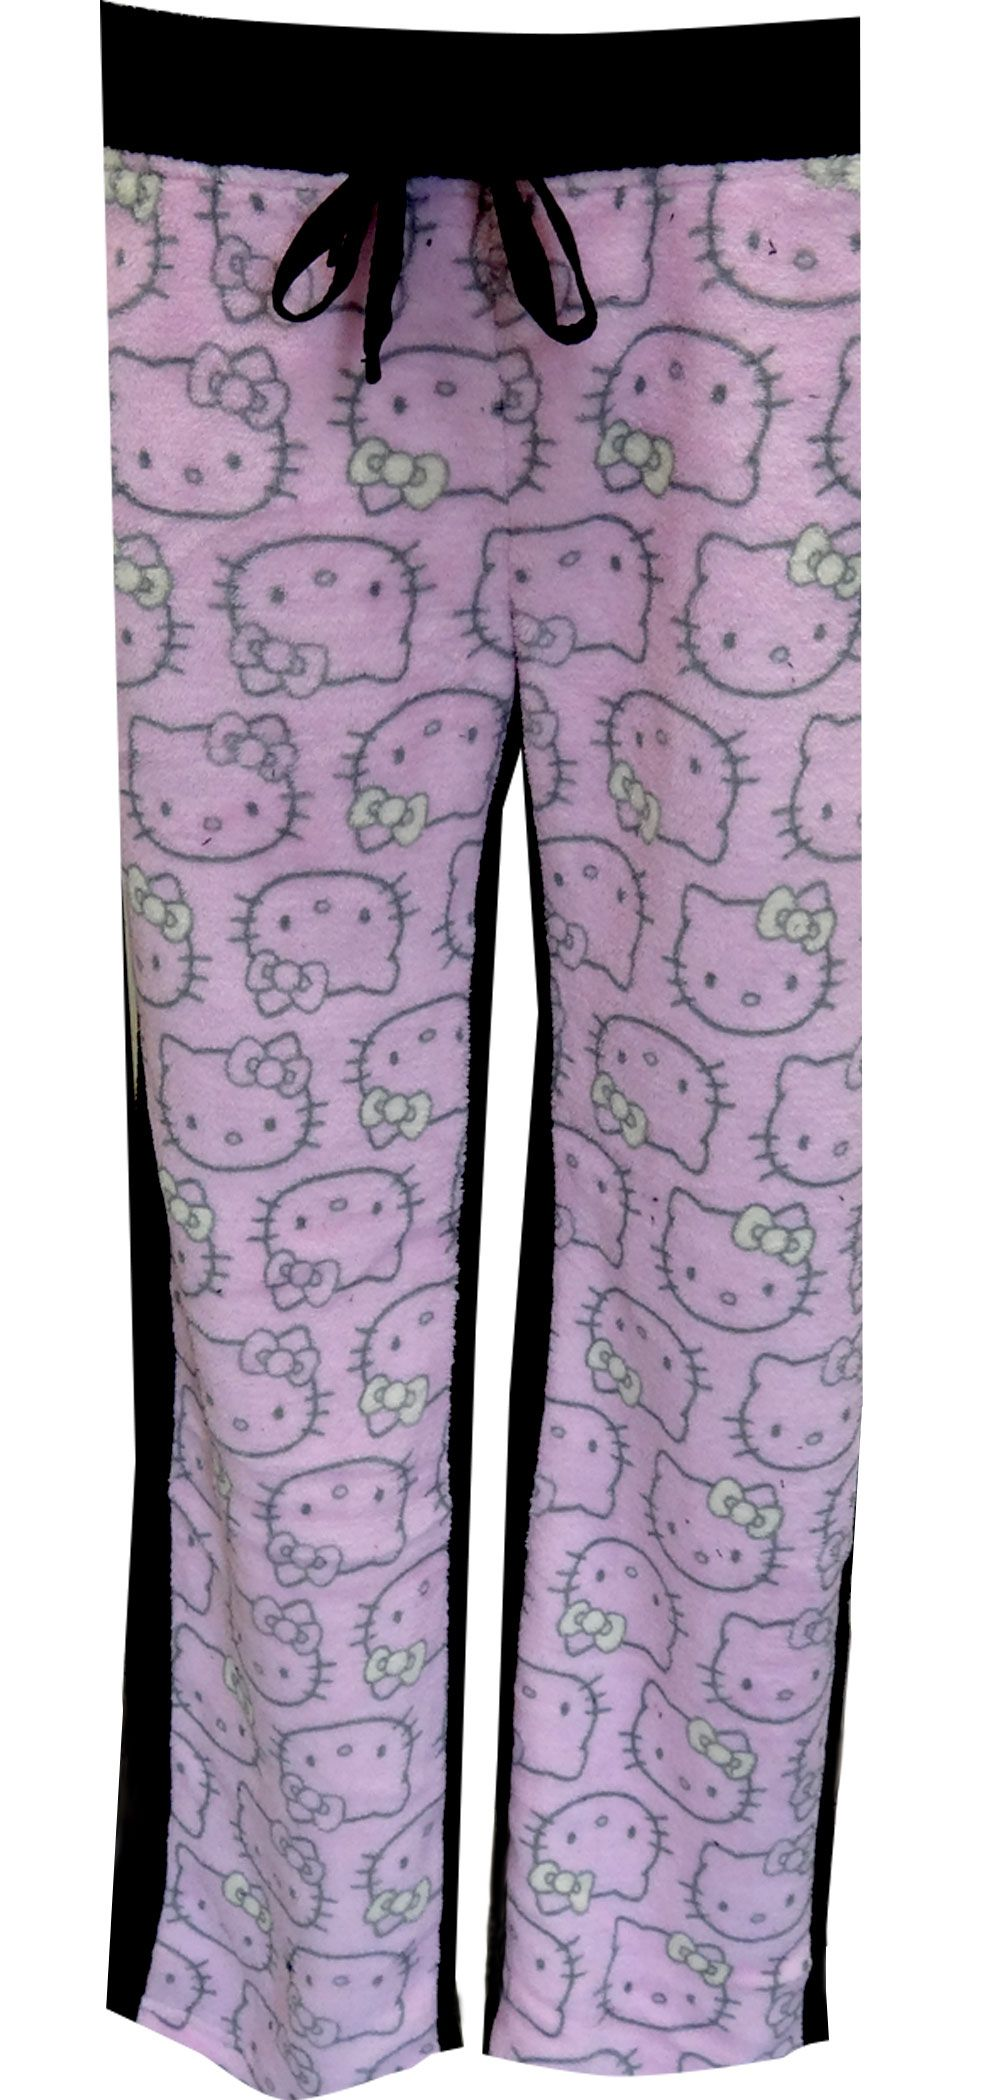 e6dbd742f WebUndies.com Hello Kitty Pink and Black Fleece Lounge Pants ...